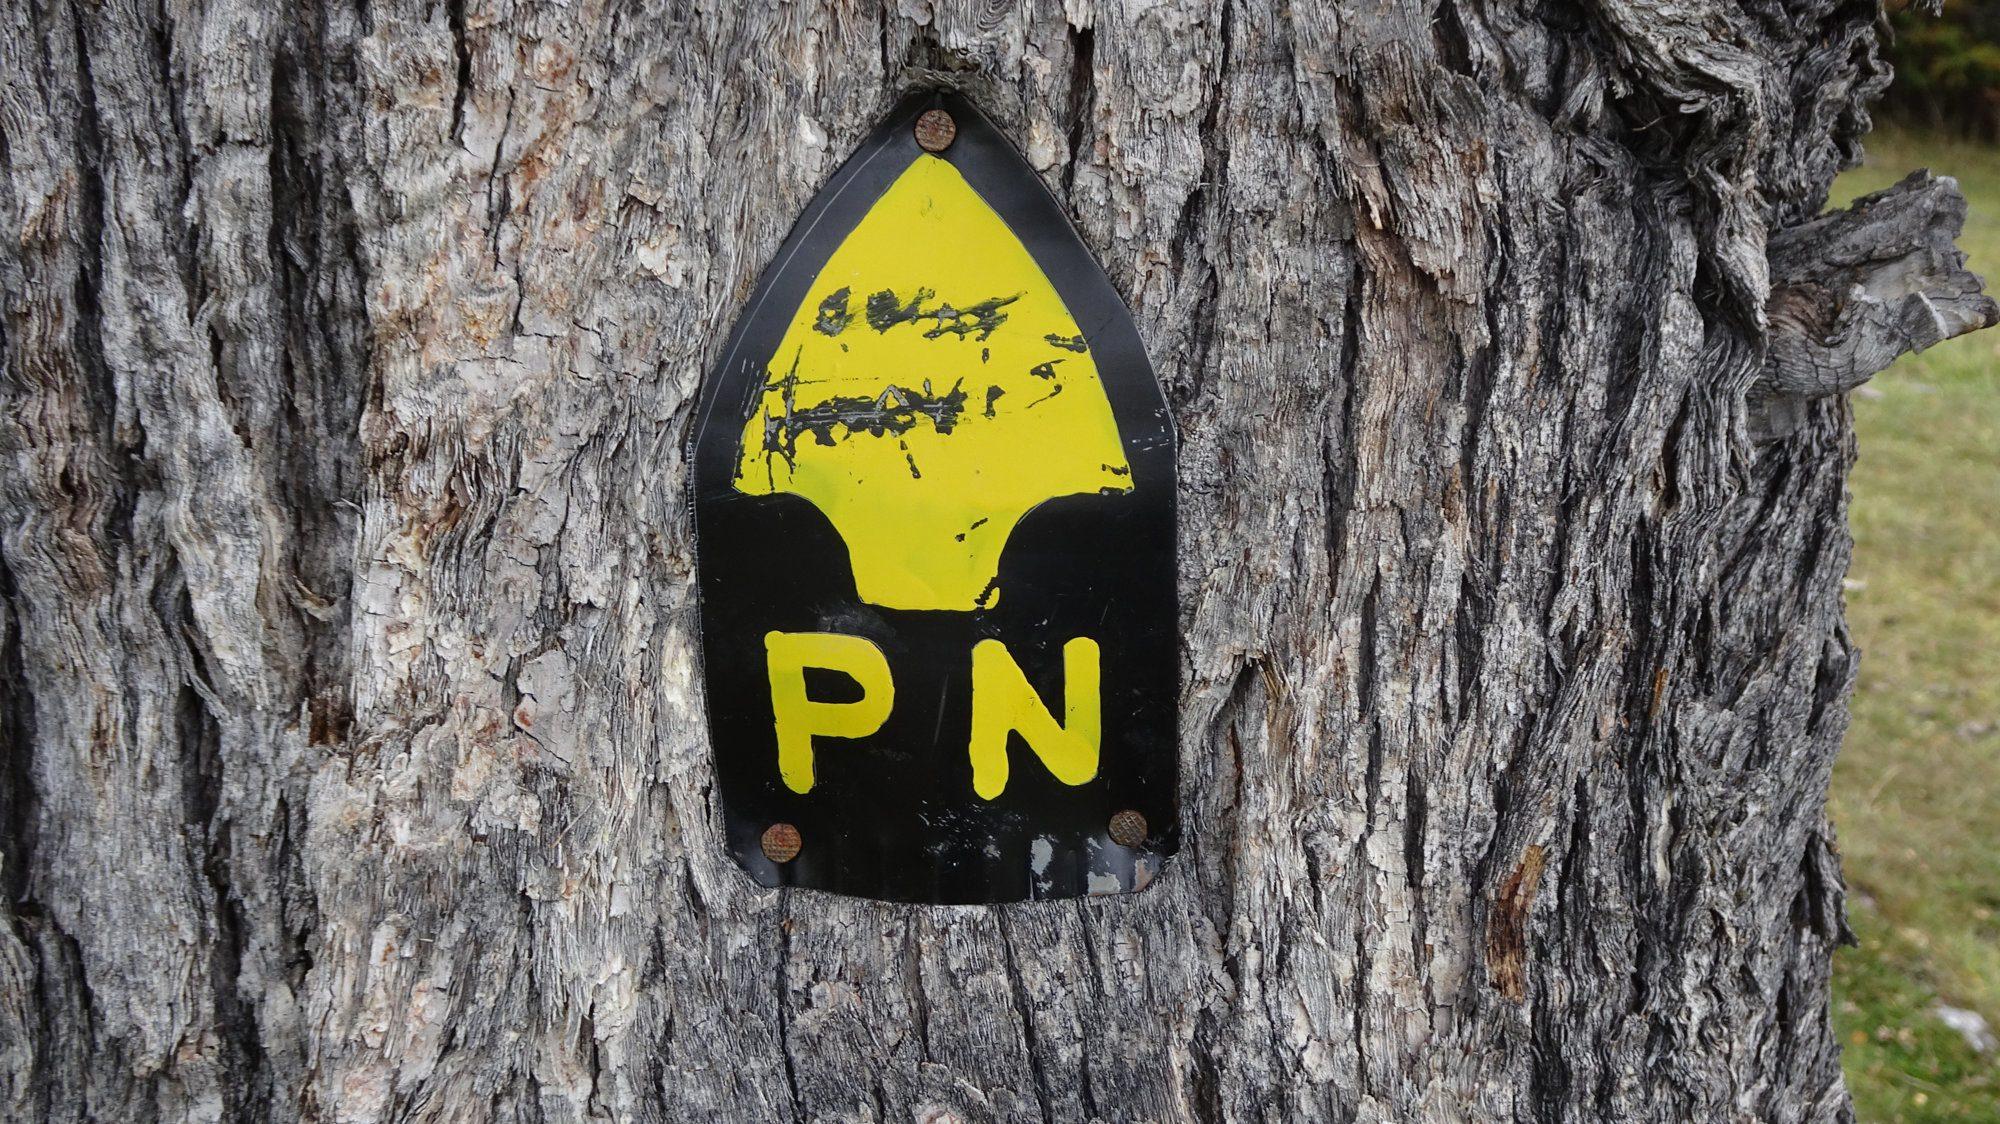 Wegmarkierung Huemul Circuit, El Chaltén, Patagonien, Argentinien, Wanderung, Trekking